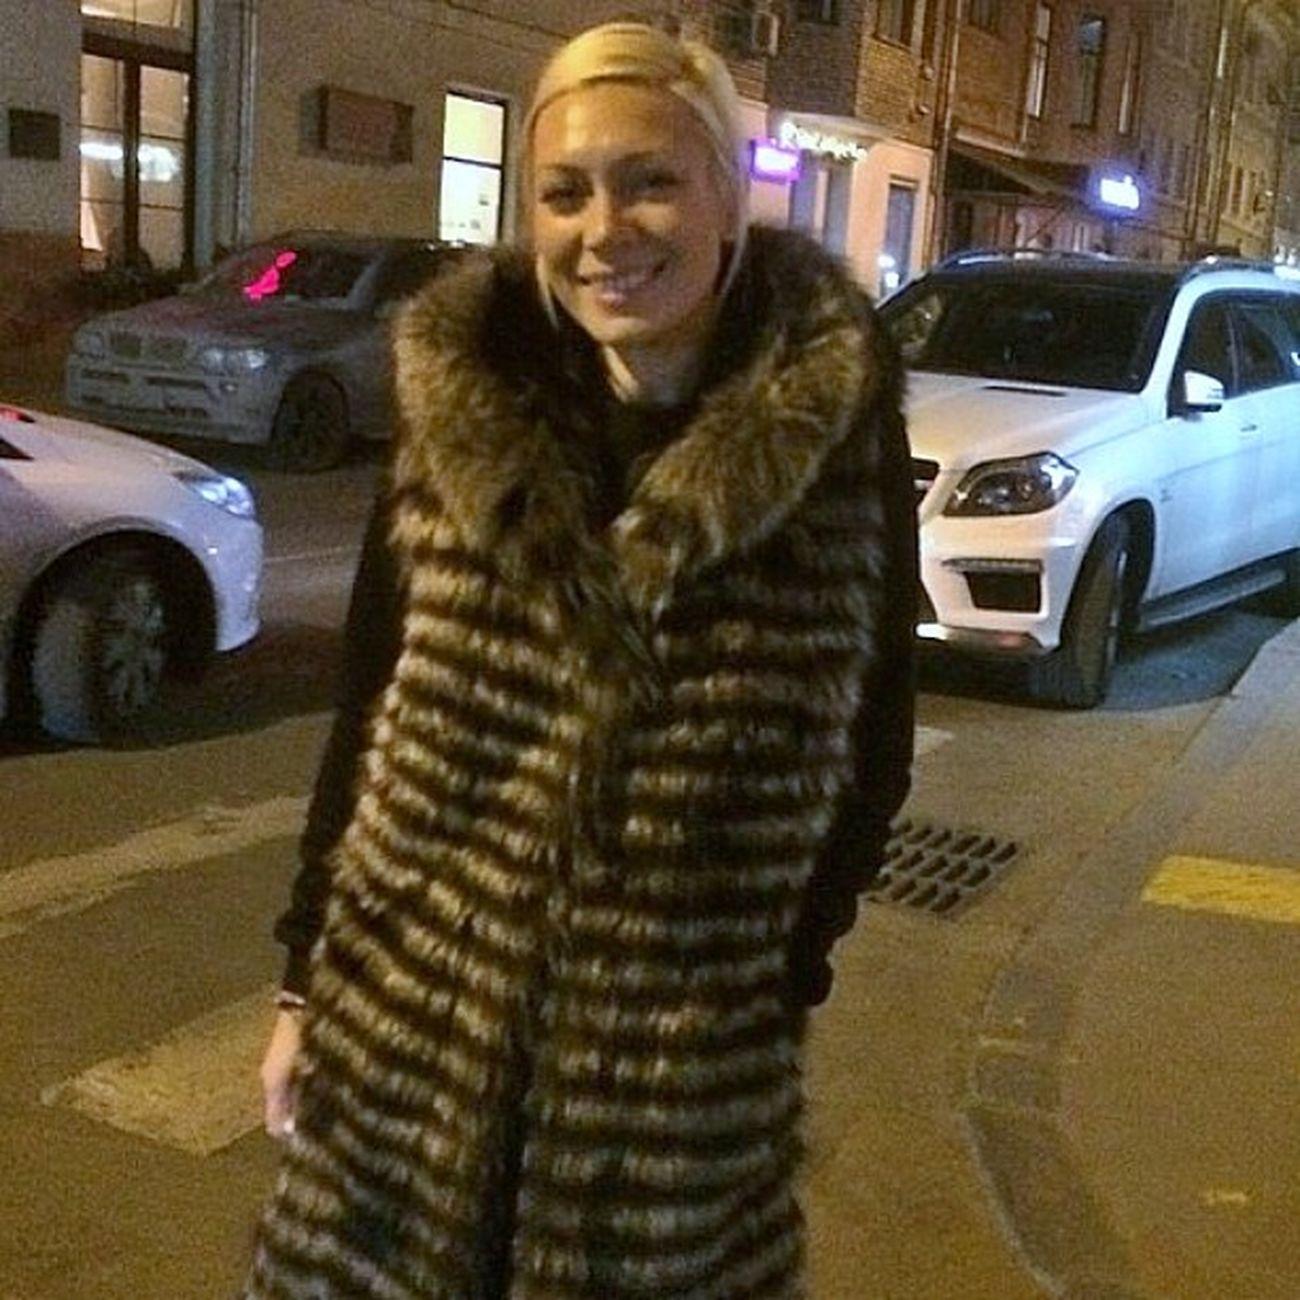 Spring Fur on the elegant Avrora in Moscow Avrora_tv Danielbenjamingeneva Danielbenjamin Geneva Switzerland Moscow Russia Astana Kazakhstan elegant spring fashion luxury @danielbenjamingeneva